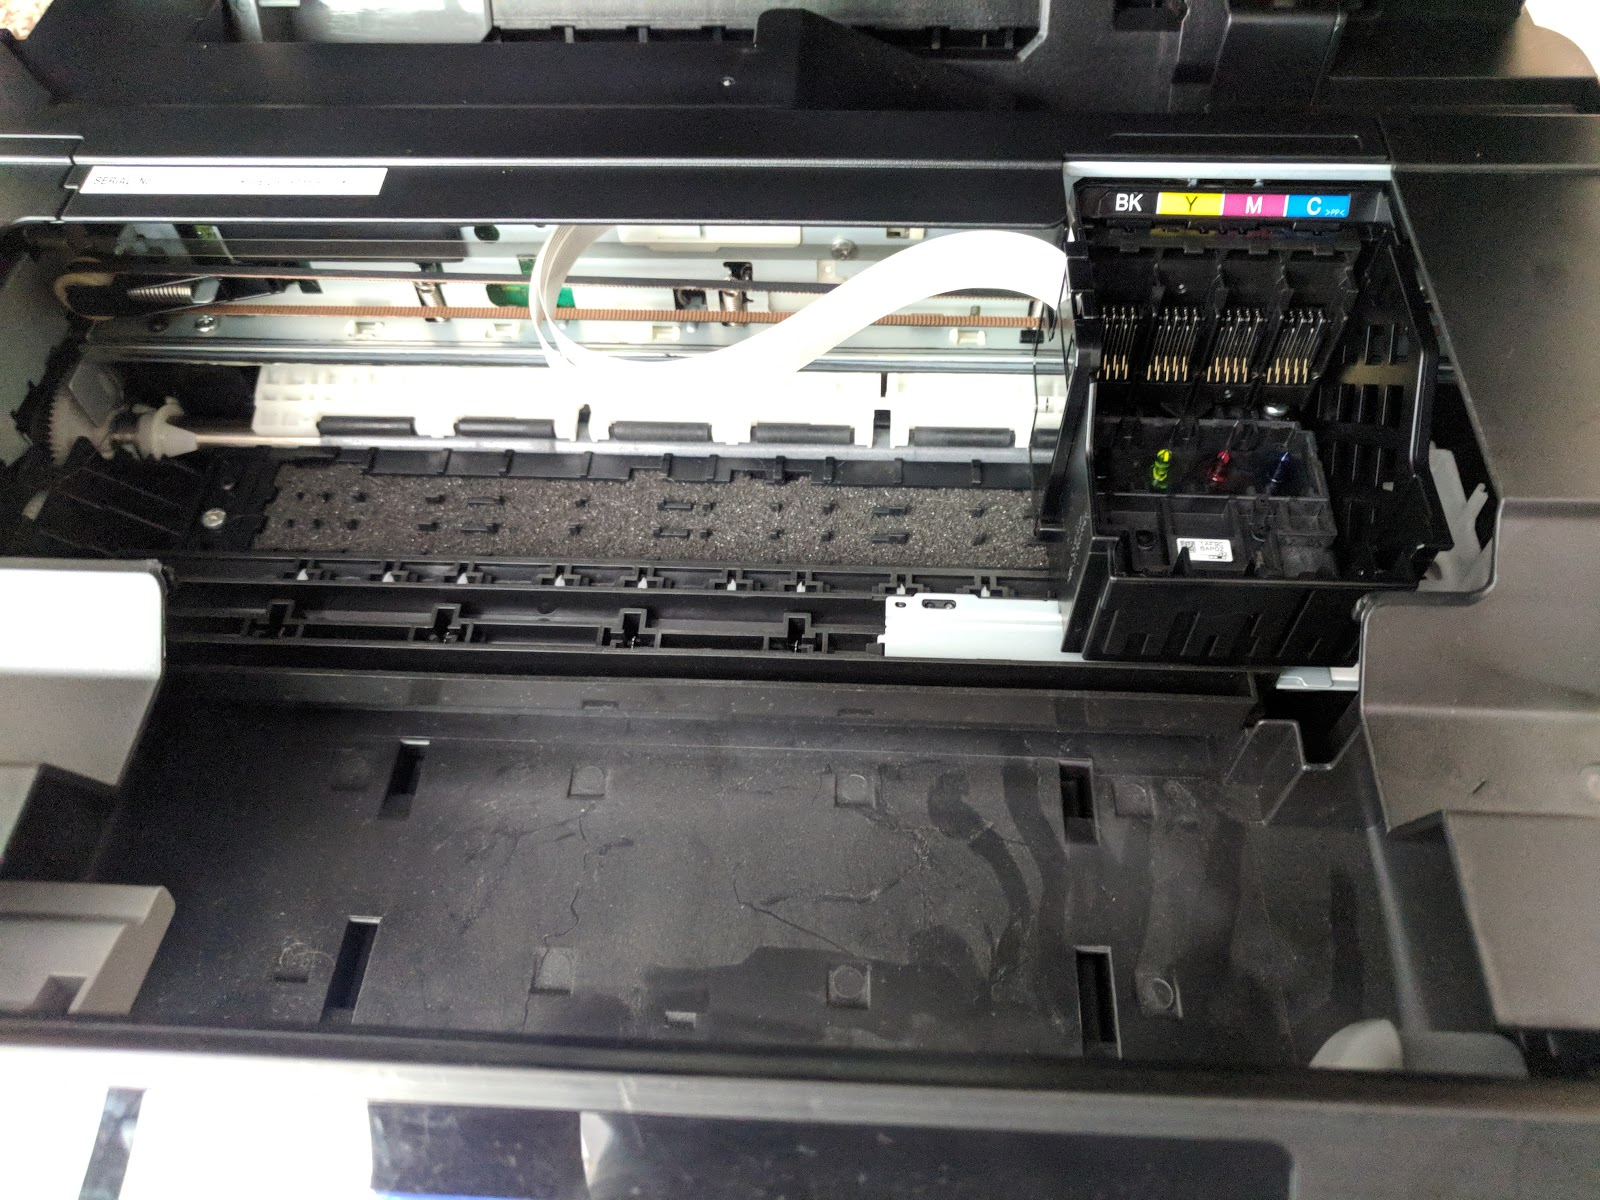 Solucionar error de absolvedor de tinta lleno impresoras for Donde reparar mi roomba